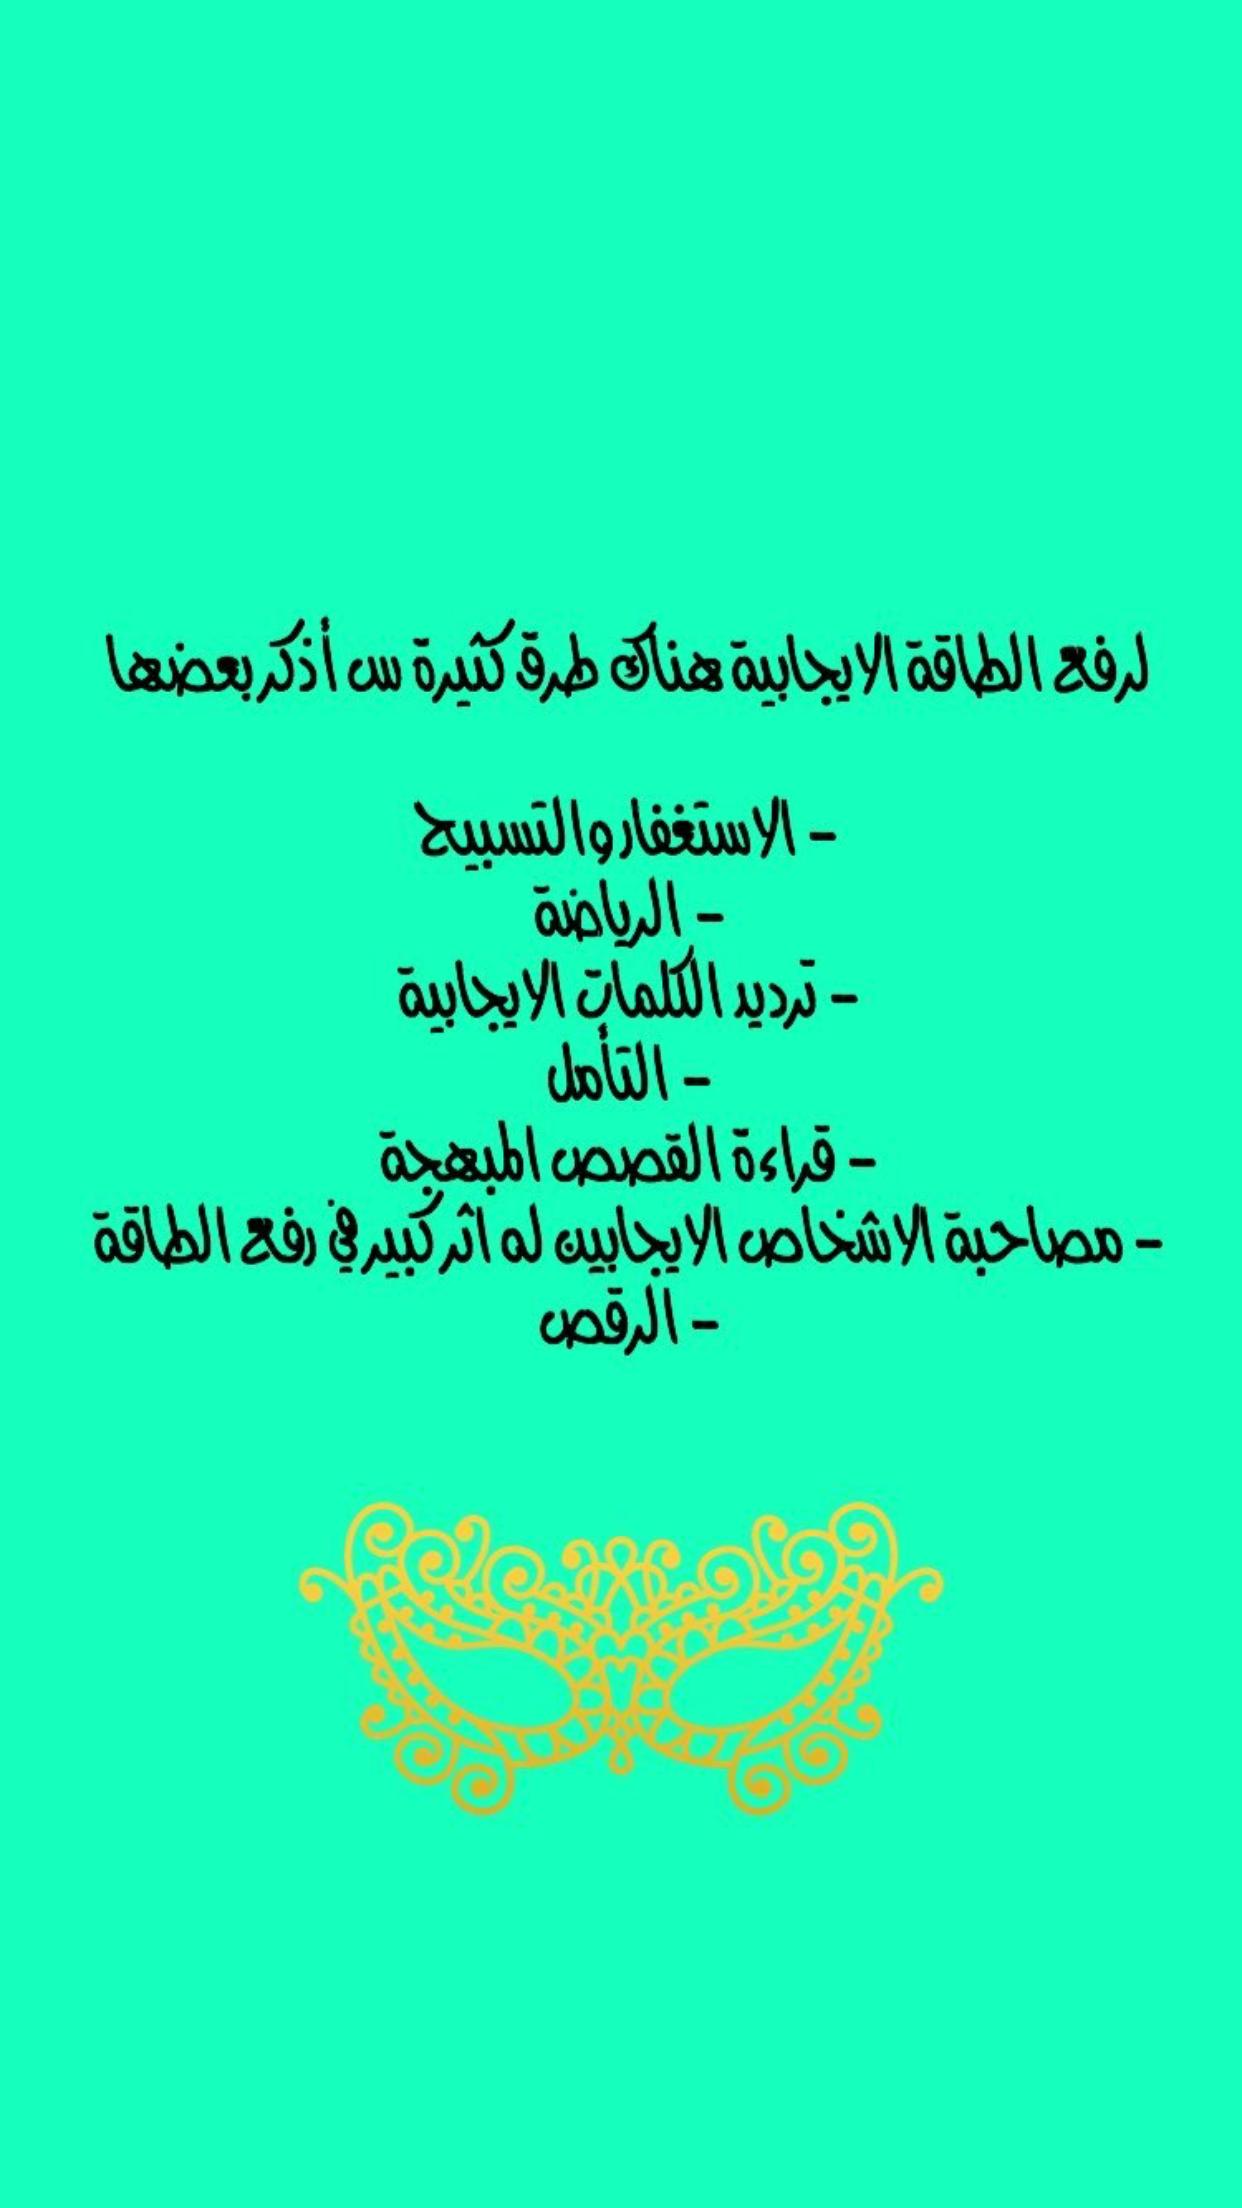 Pin By Reem M On إيجابيه Atl